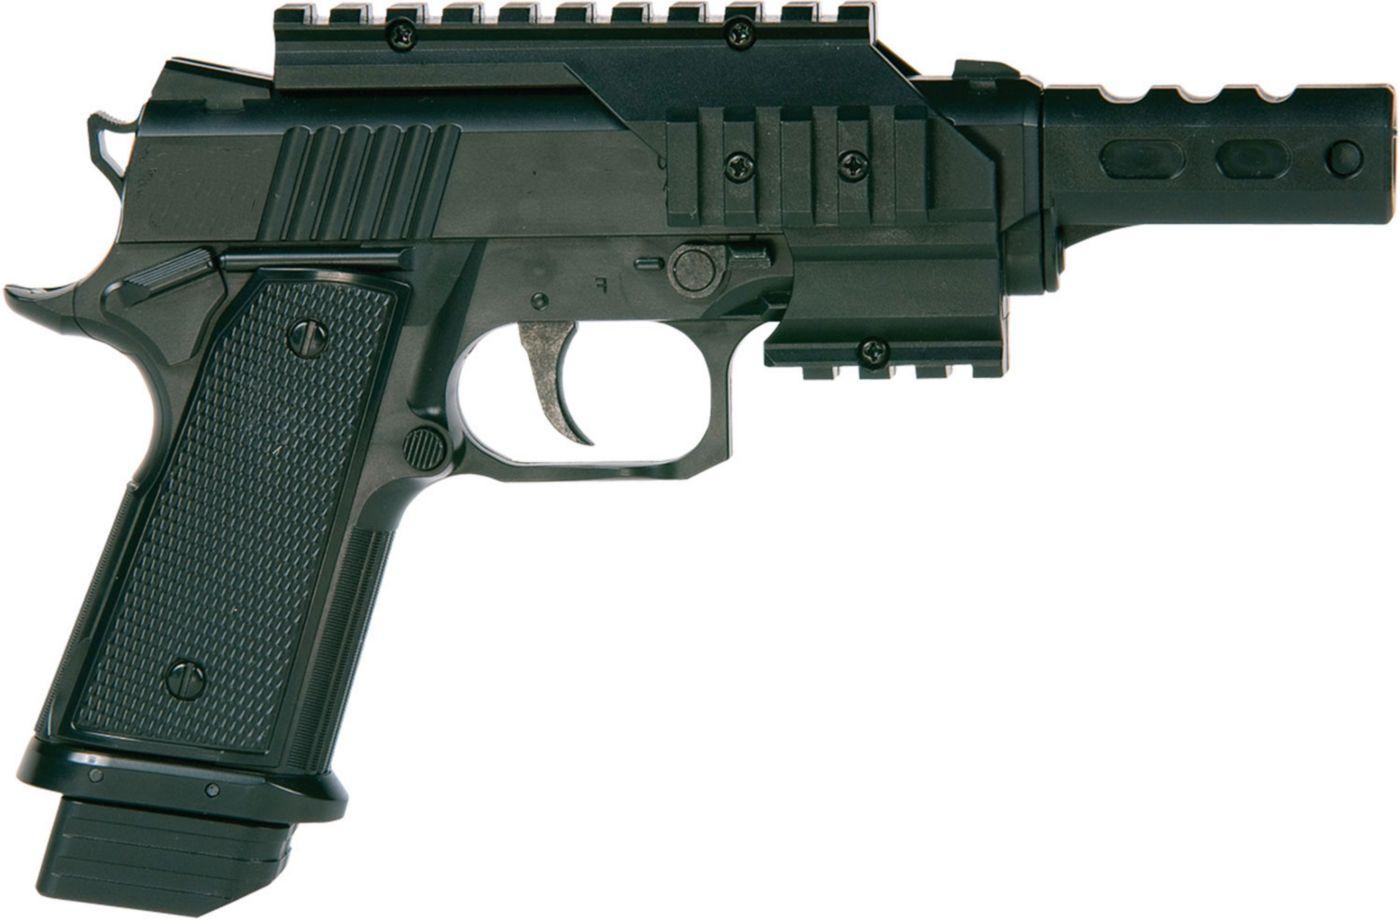 Daisy PowerLine Model 5170 BB Gun - Synthetic